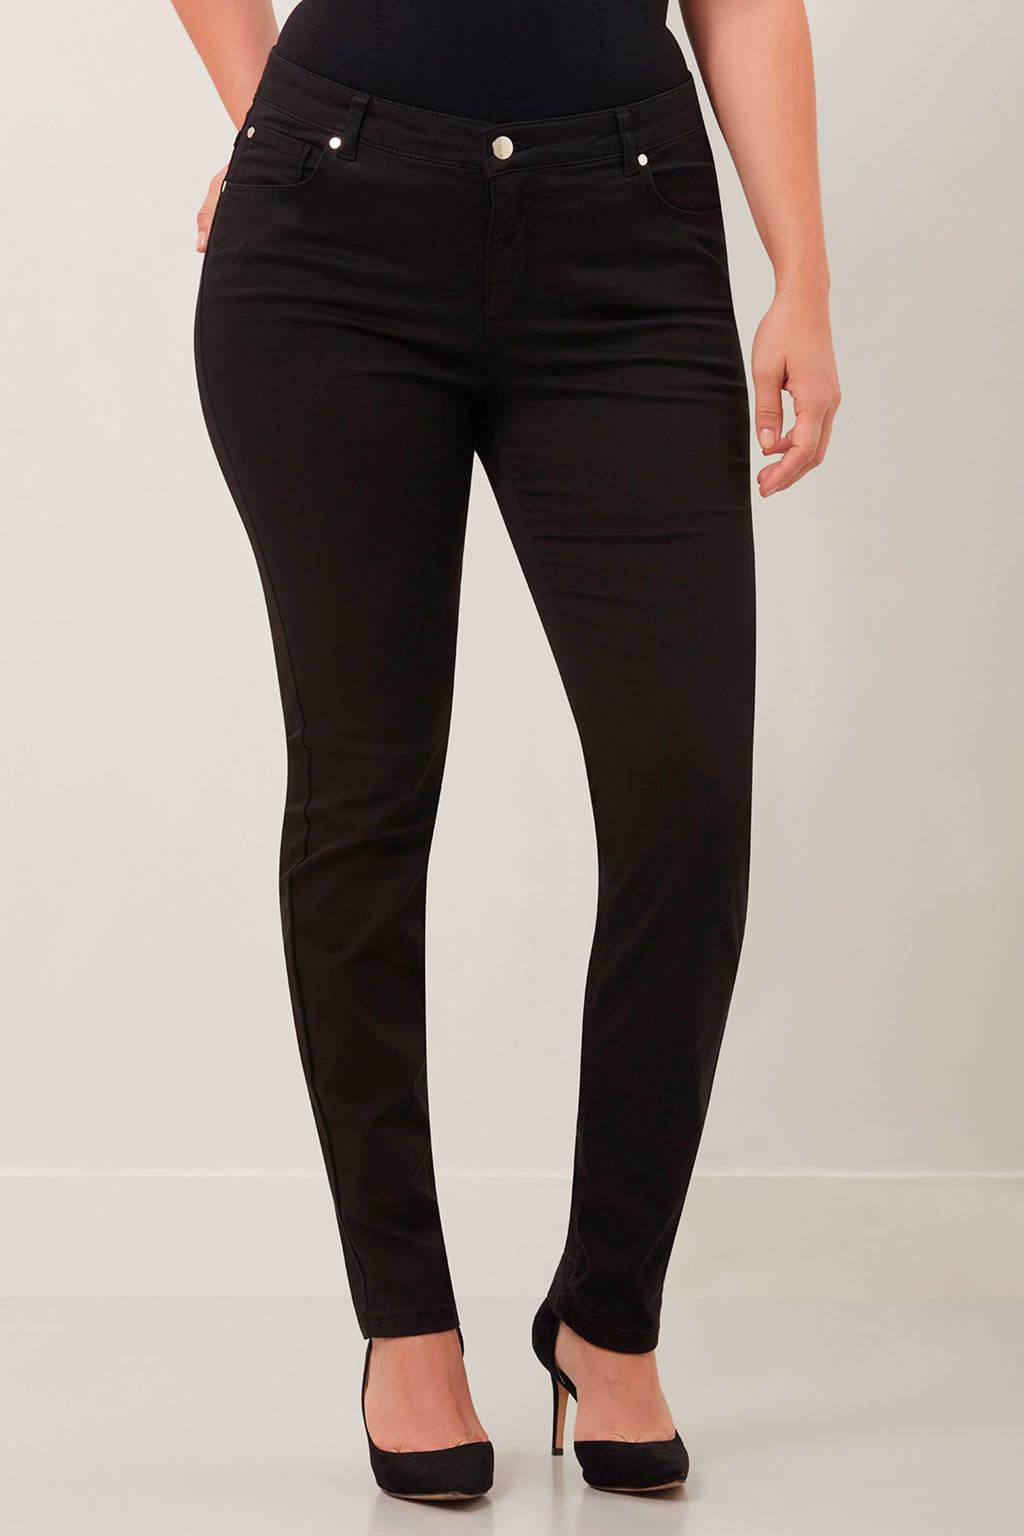 MS Mode slim fit broek, Zwart